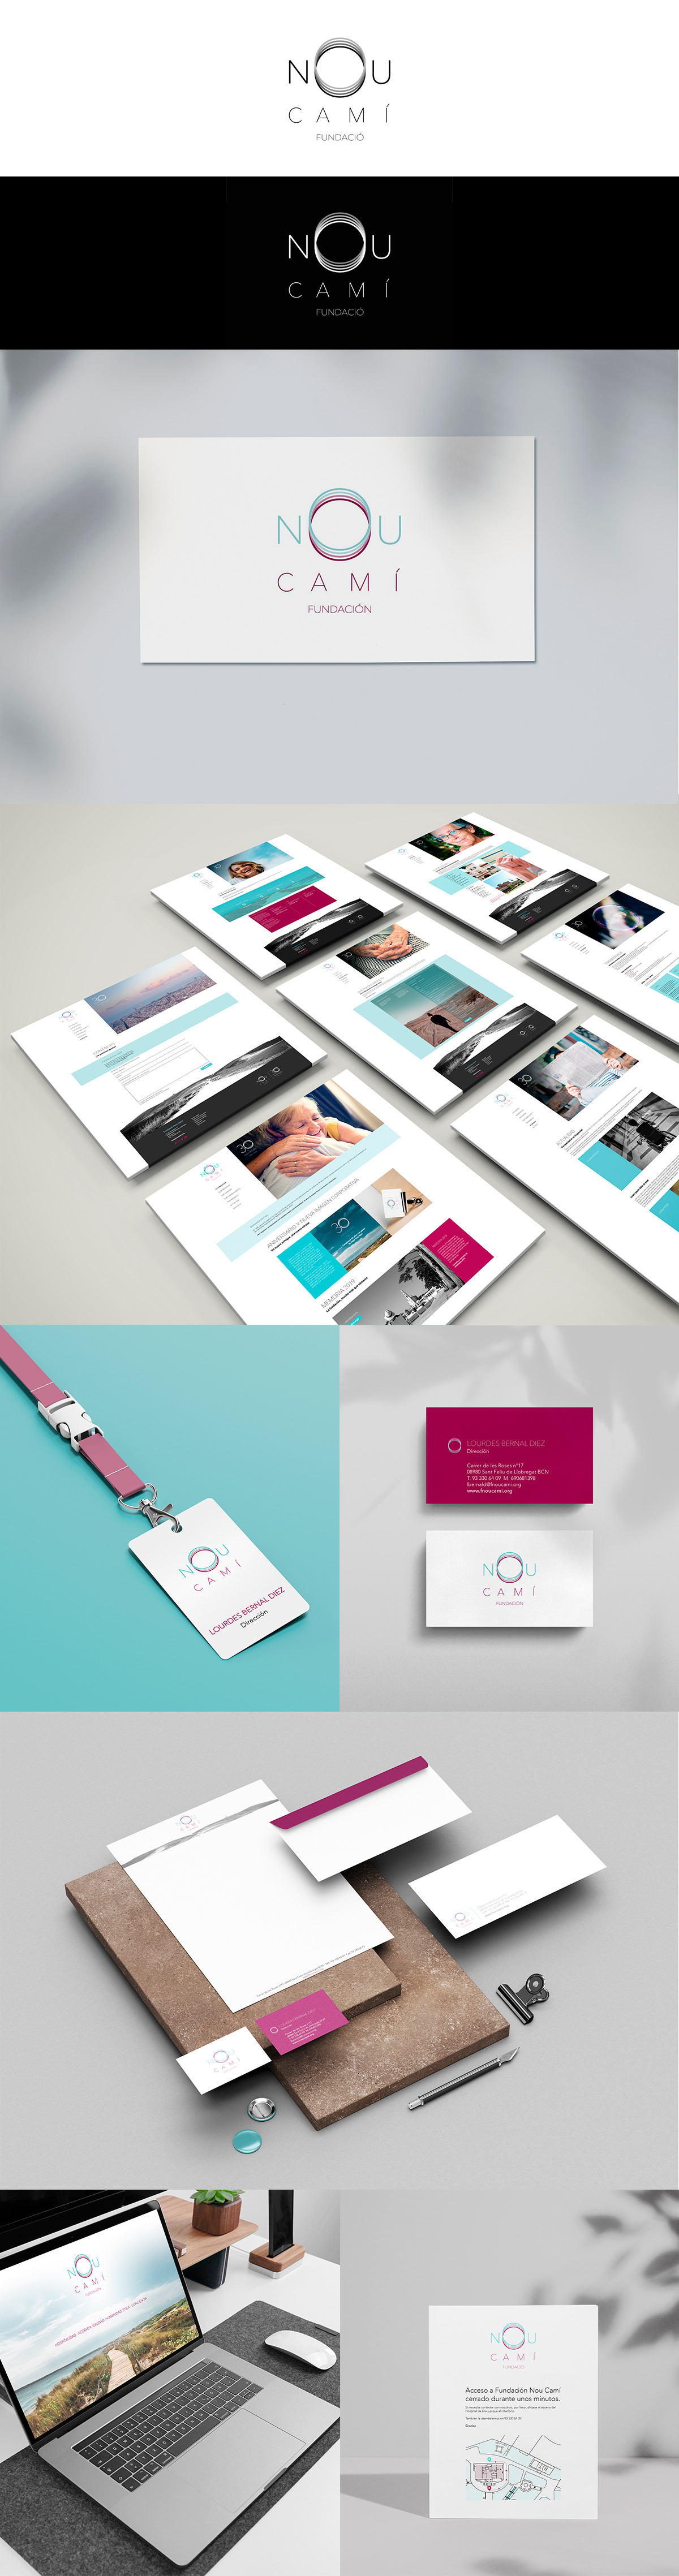 #Branding #Design #web